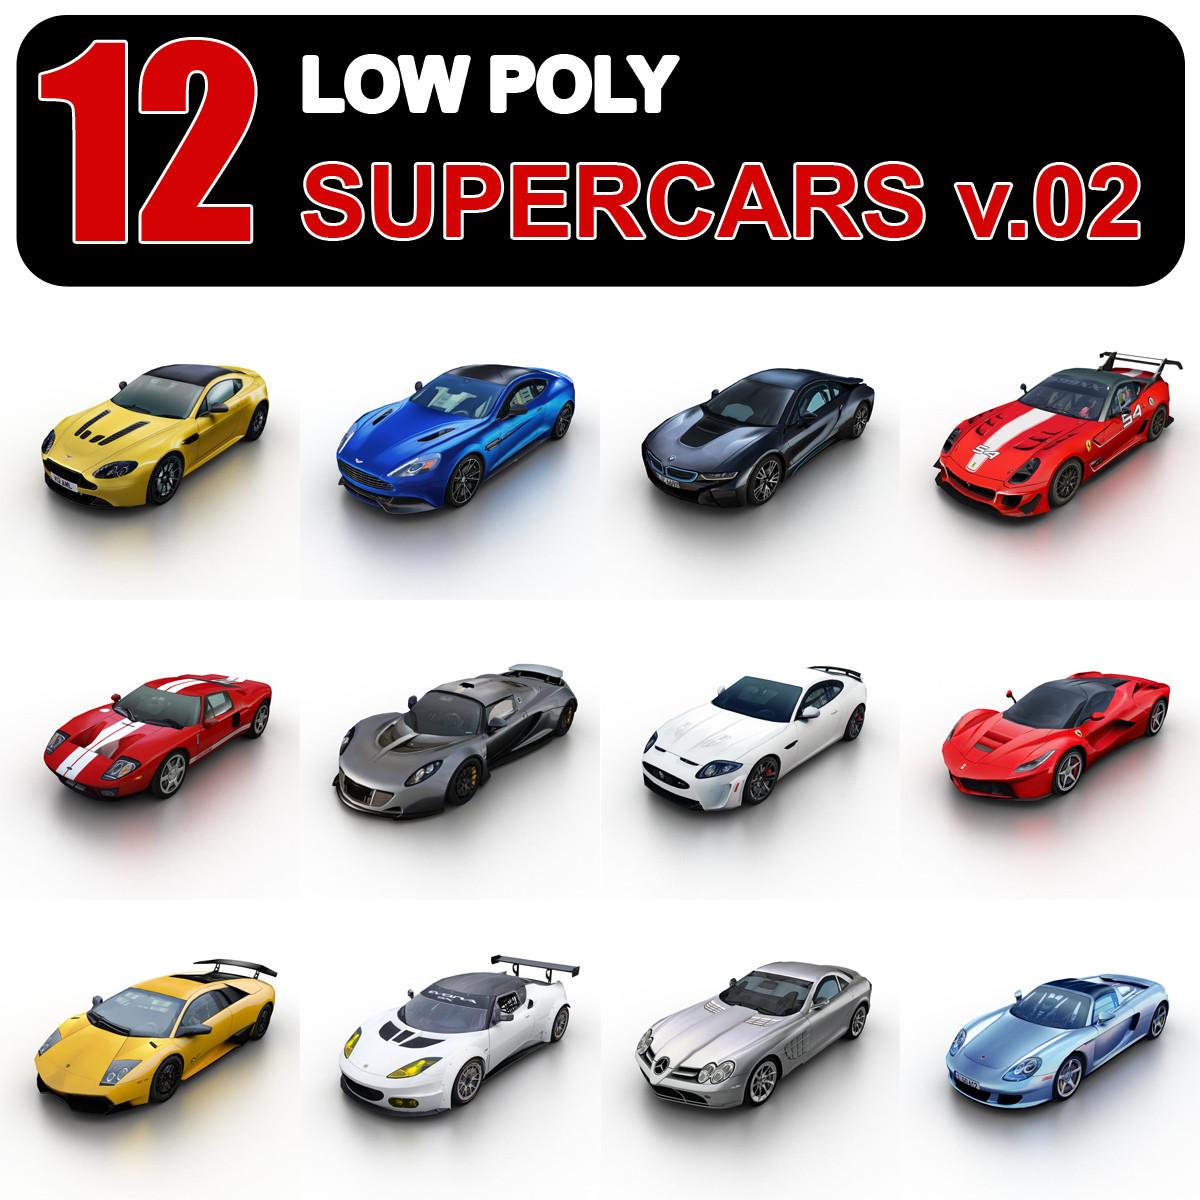 Supercars02.jpg